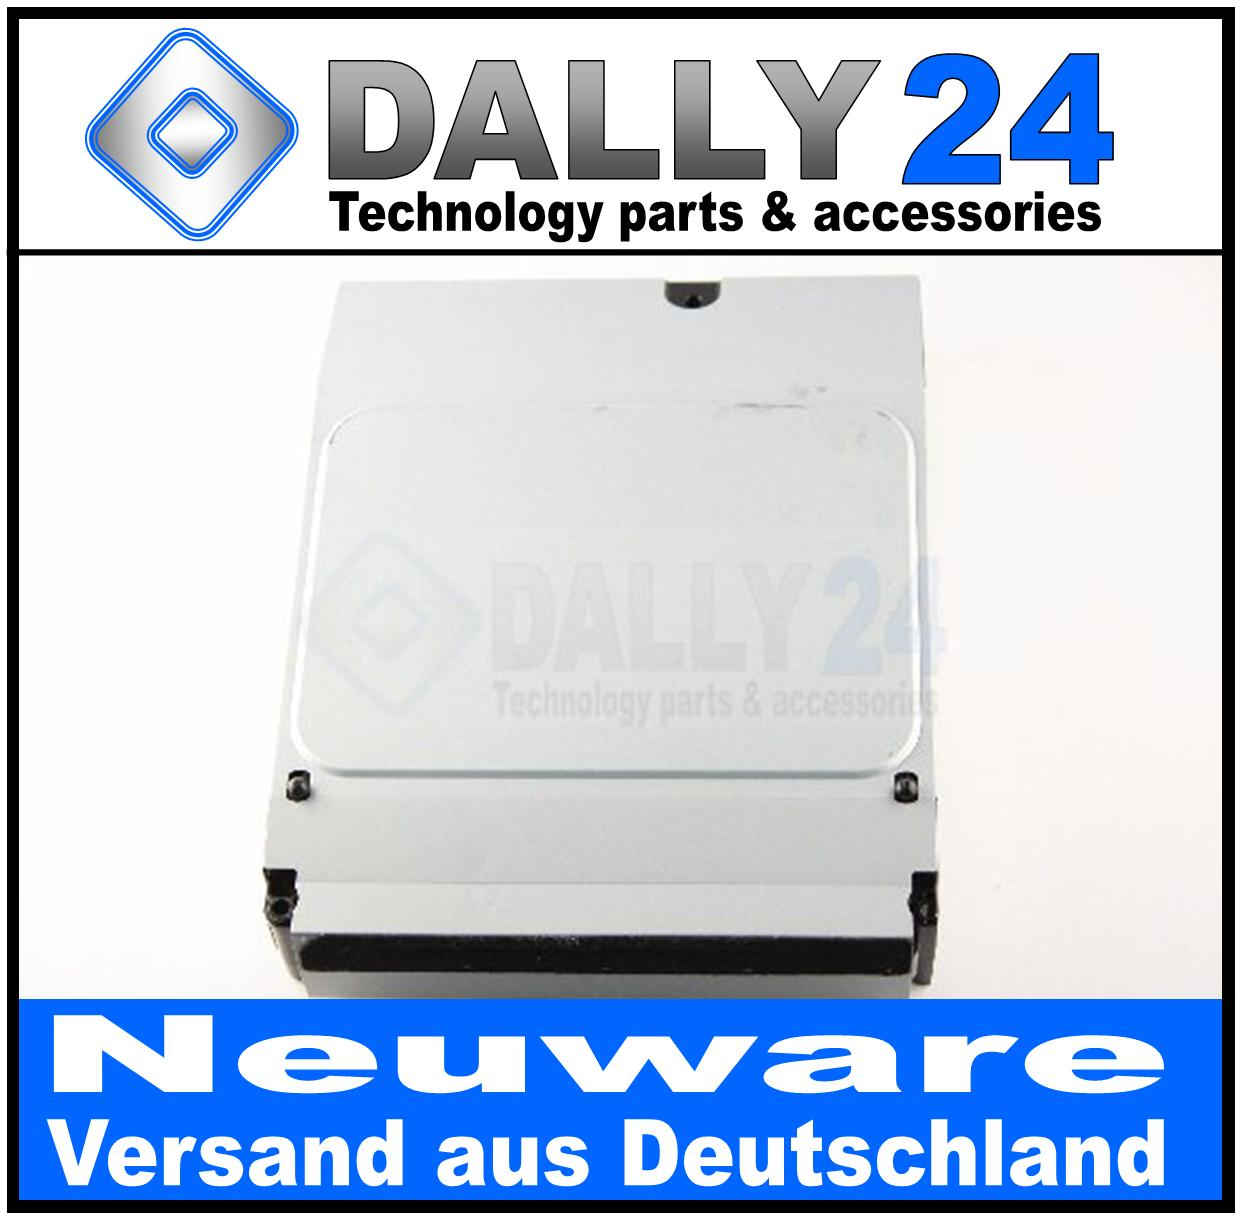 PLAYSTATION-3-ERSATZ-BLUE-RAY-LAUFWERK-410ACA-komplett-inkl-Torx-amp-Platine